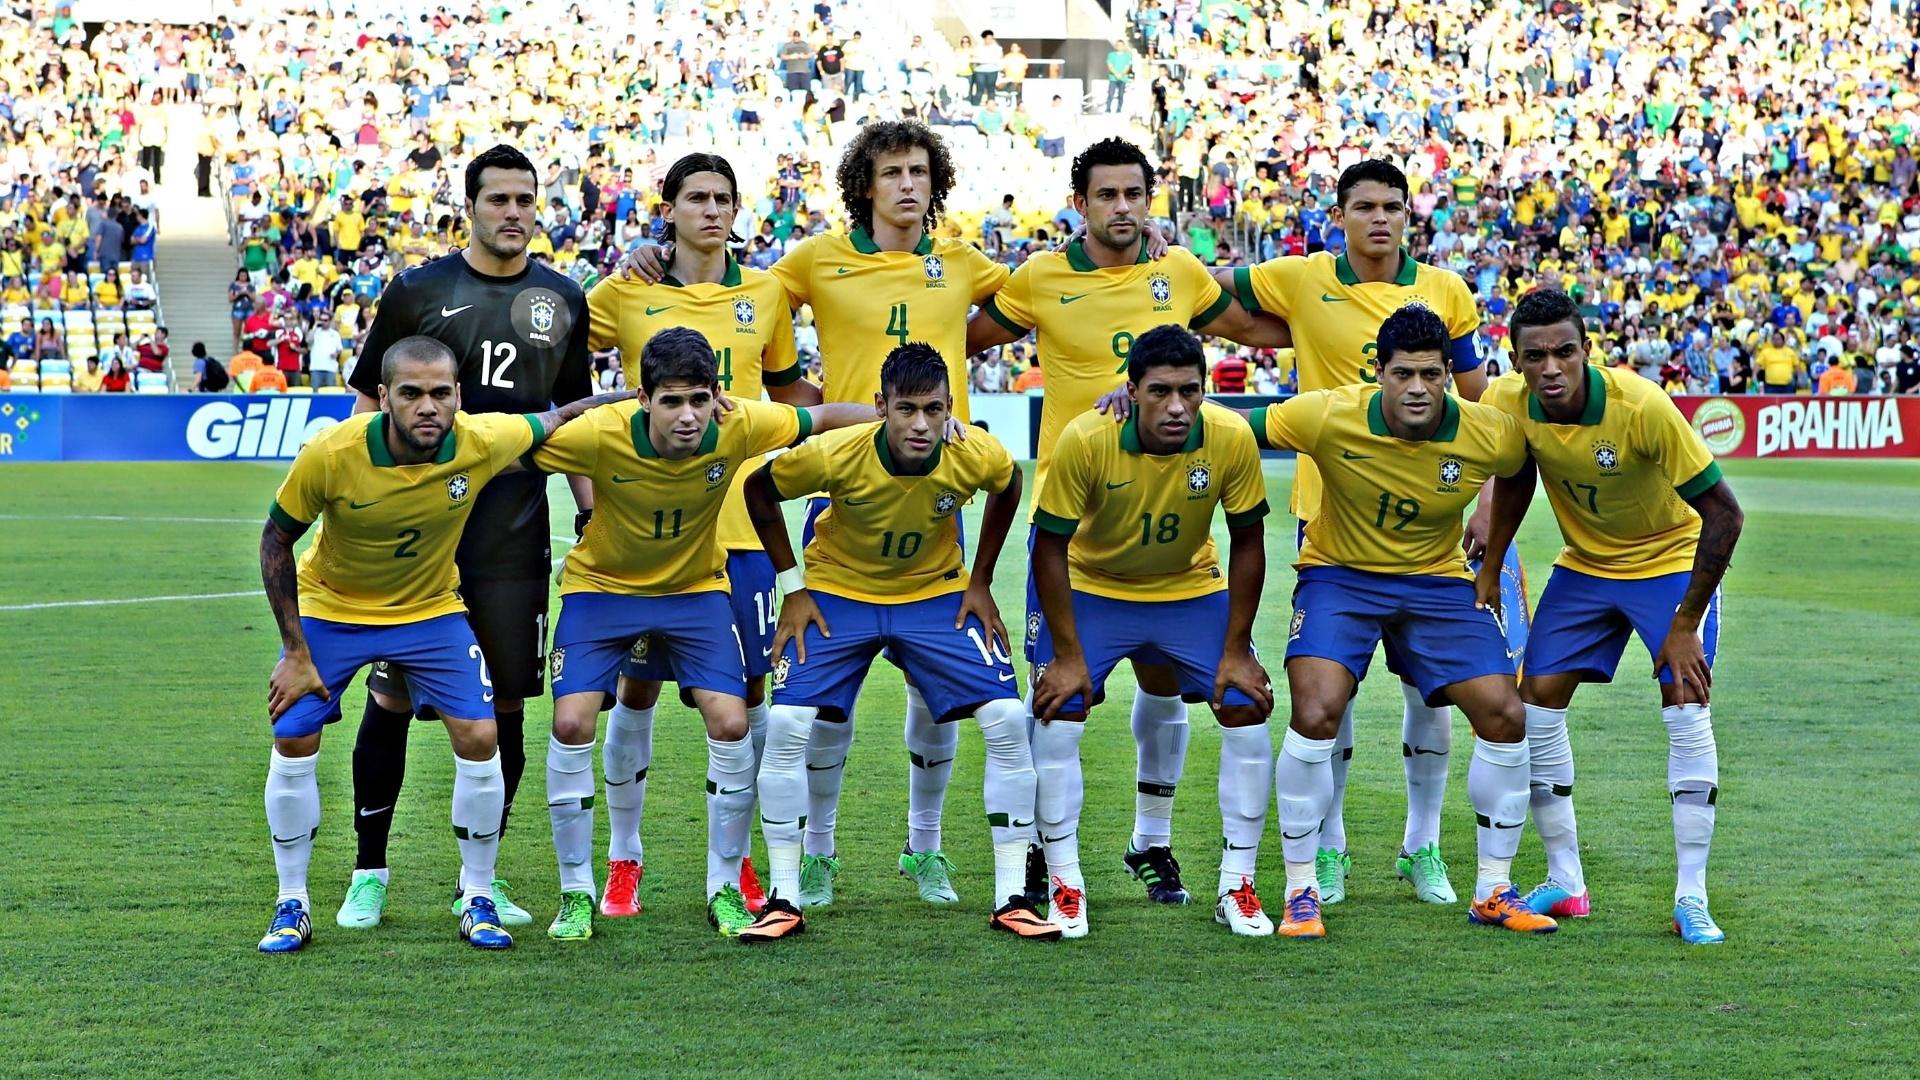 надо обои на рабочий стол бразилия футбол много нового фотоаппаратах